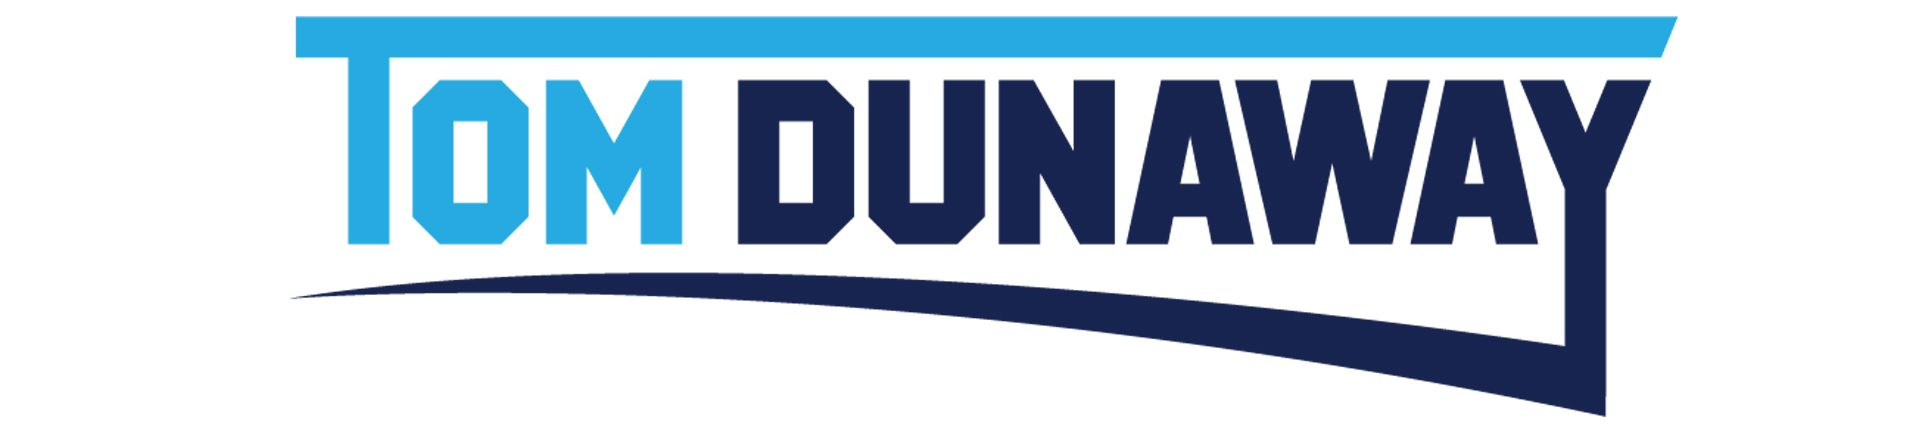 TomDunaway.com